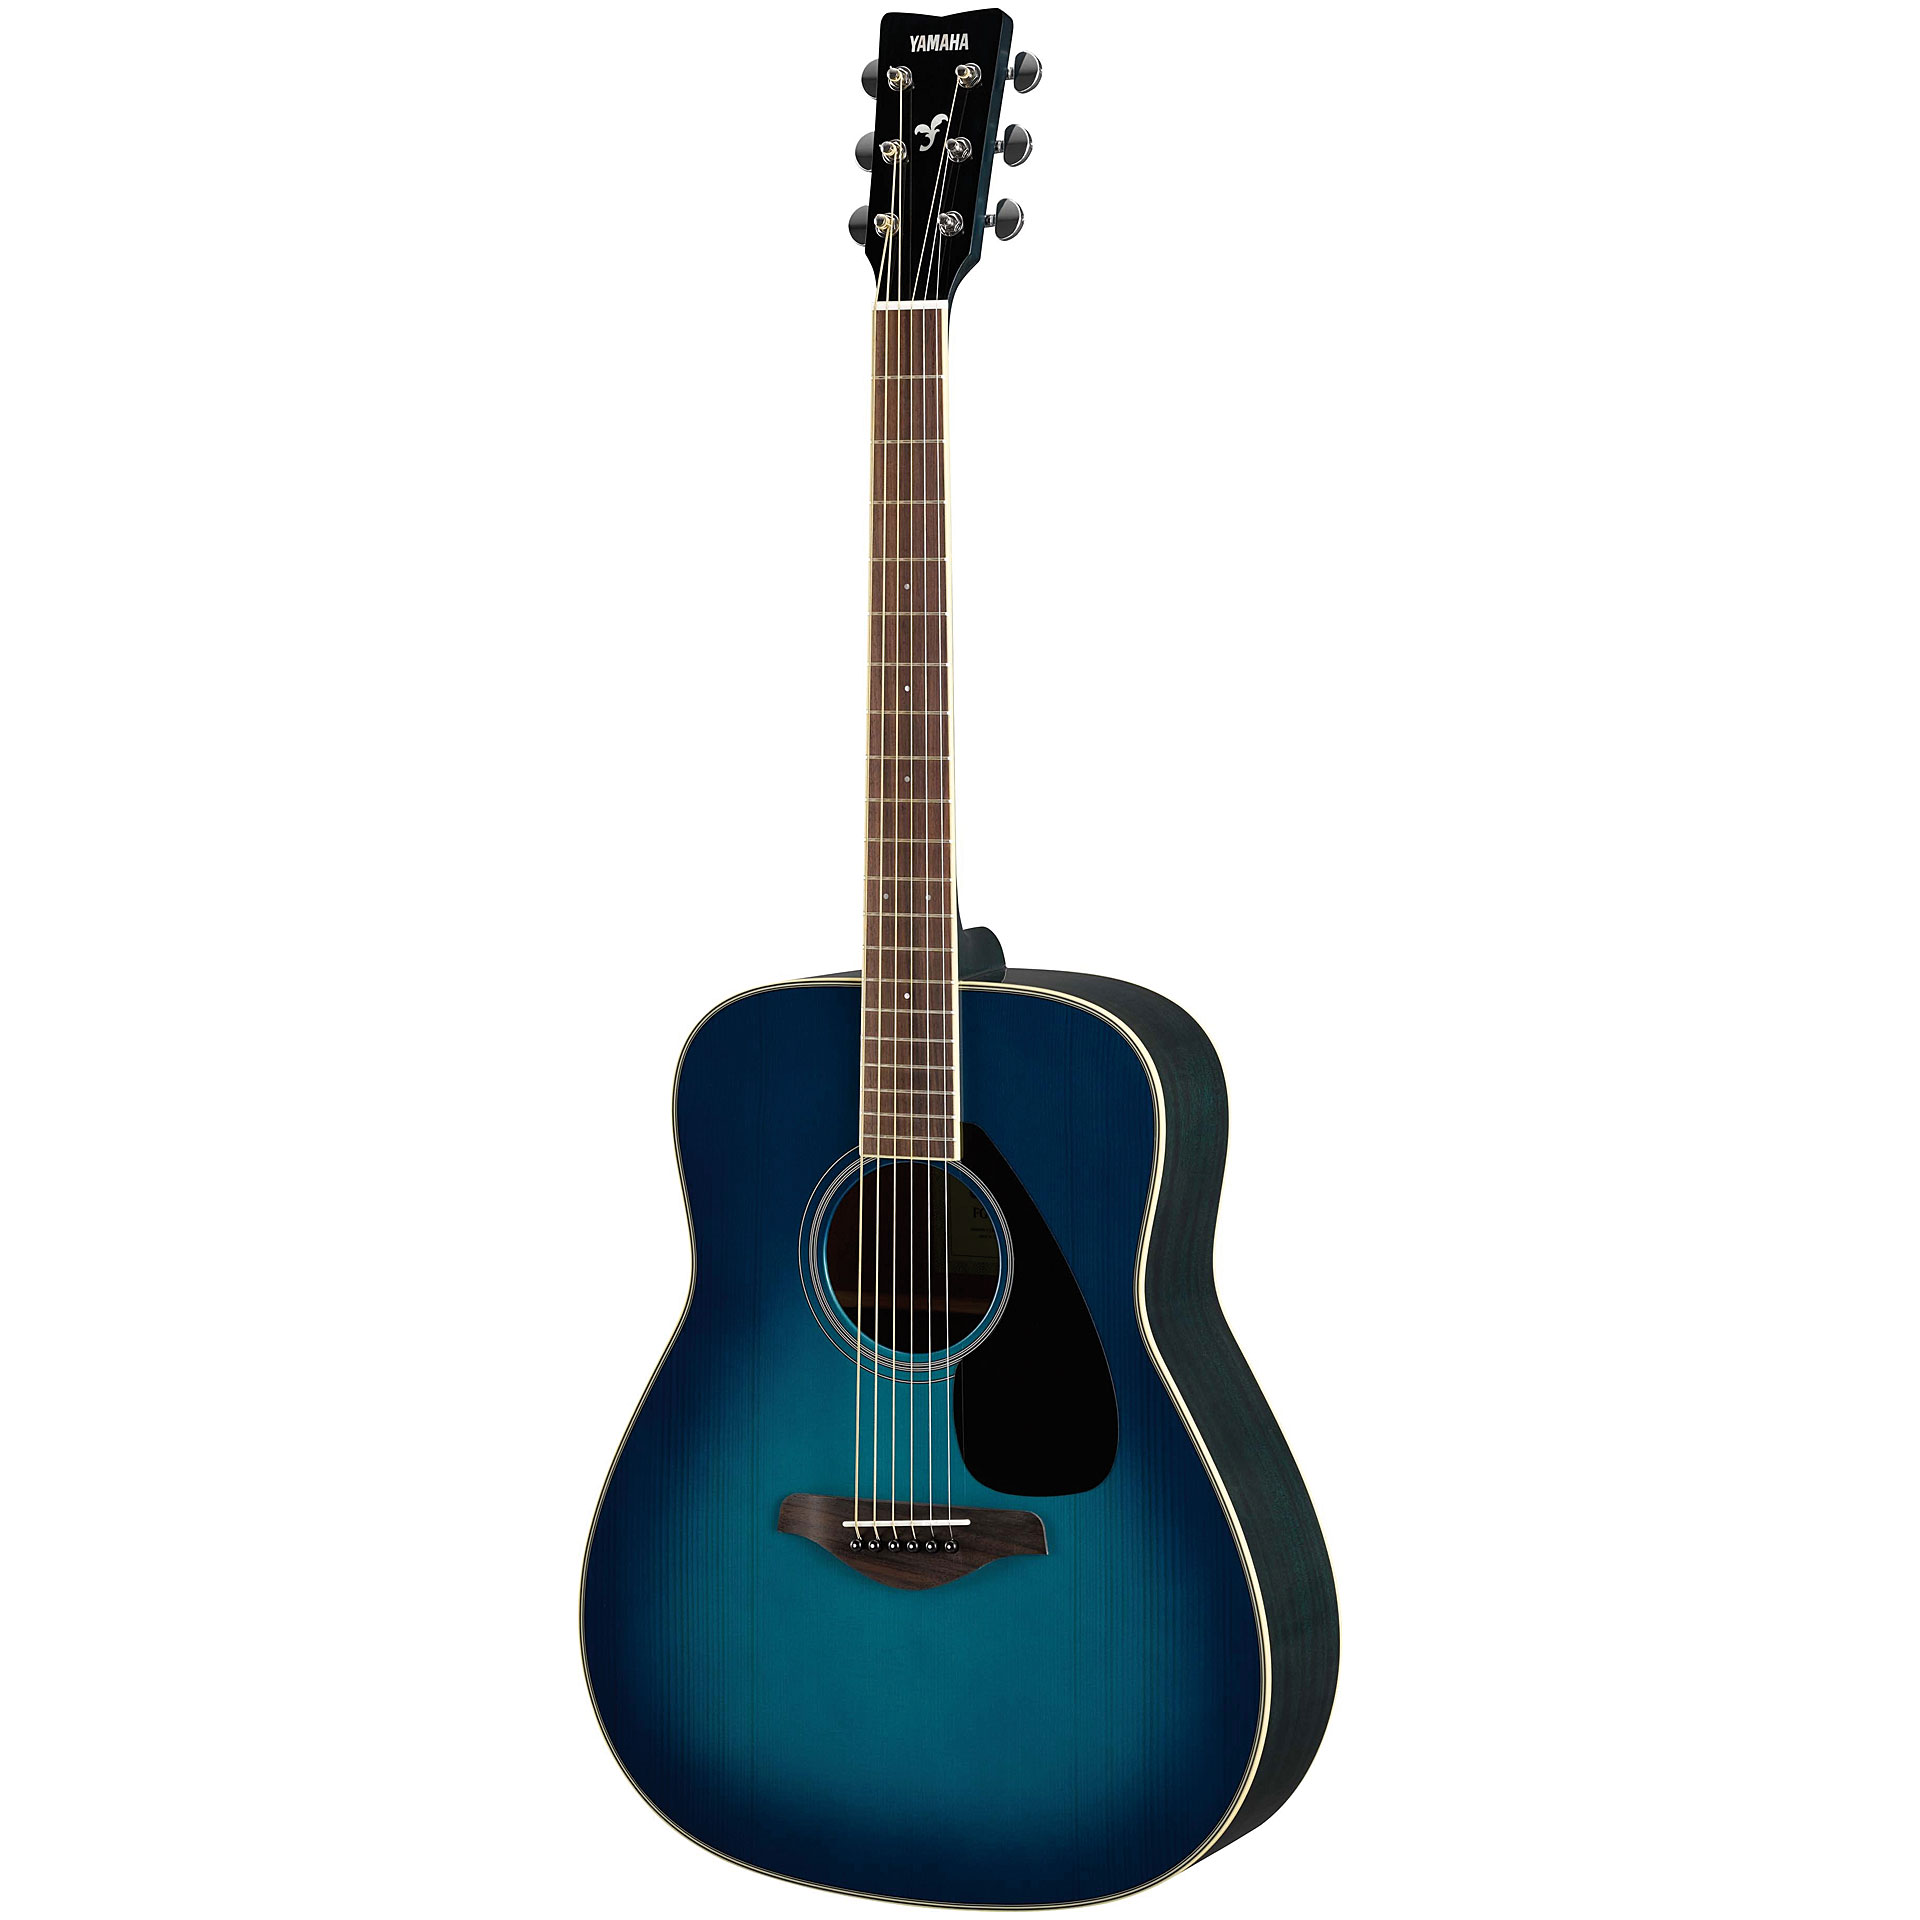 Yamaha Acoustic Guitar Fgs Price